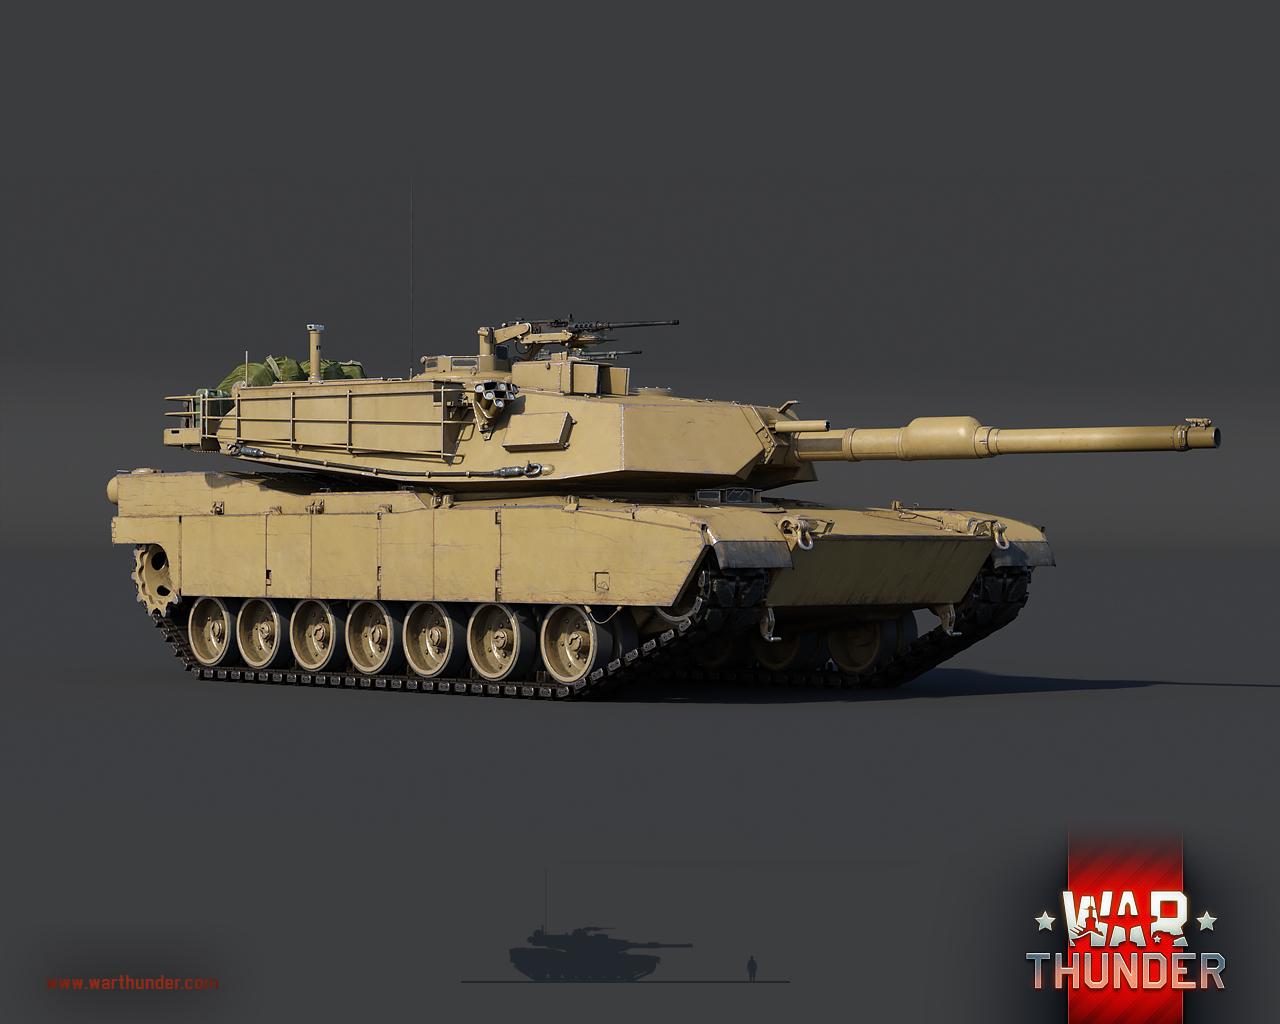 [Development] M1A1 Abrams: Leaping Forward - News - War Thunder